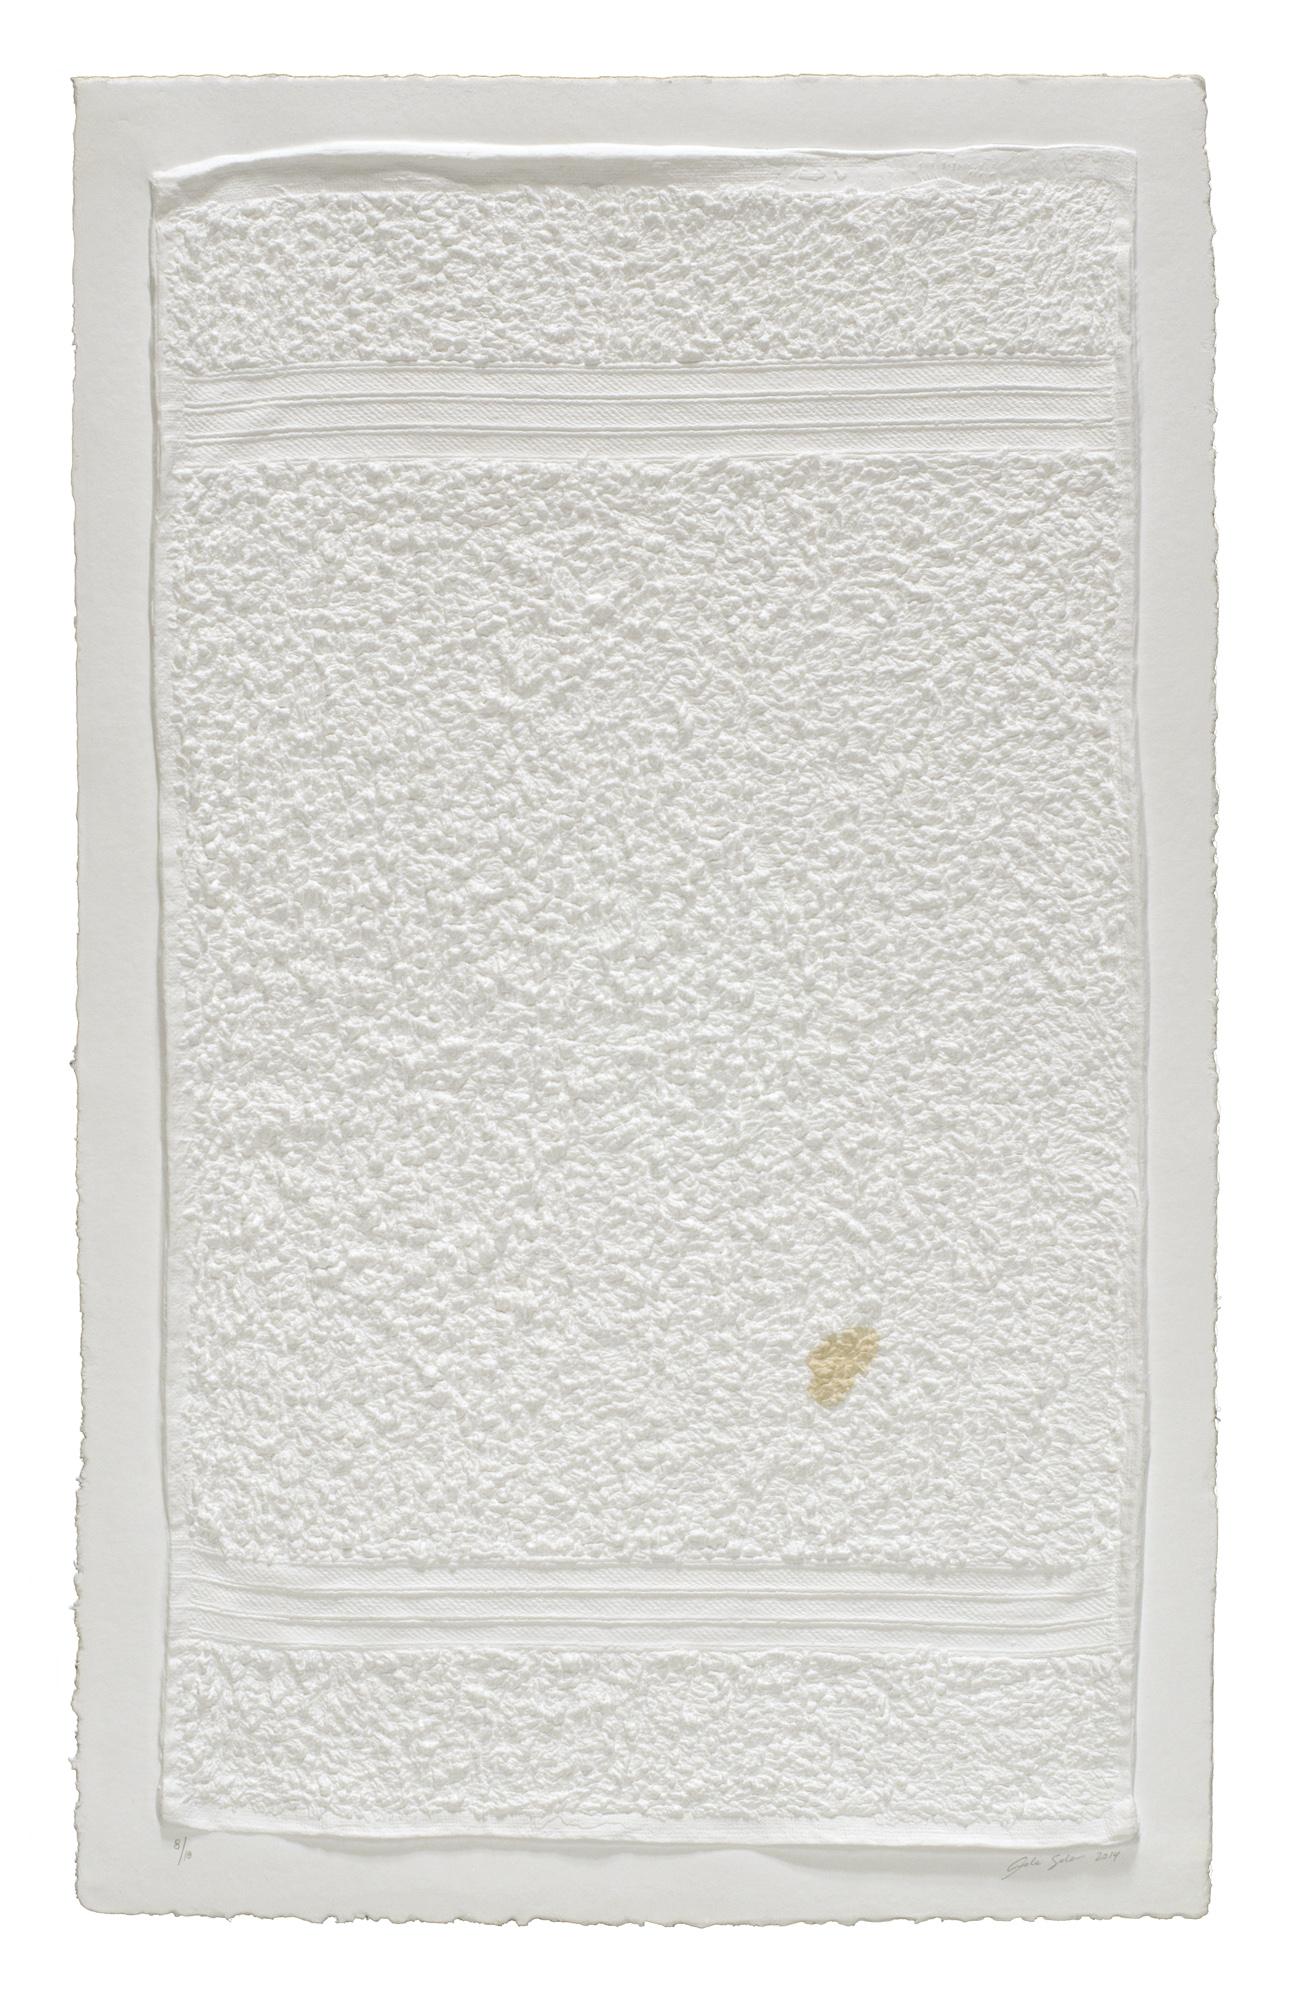 Analia Saban , Three Stripe Hand Towel (with Stain), 2014 Mixografia monoprint on handmade paper ed. 13/18 78,5 x 50,5 cm - 30 7/8 x 19 7/8 inches (framed)